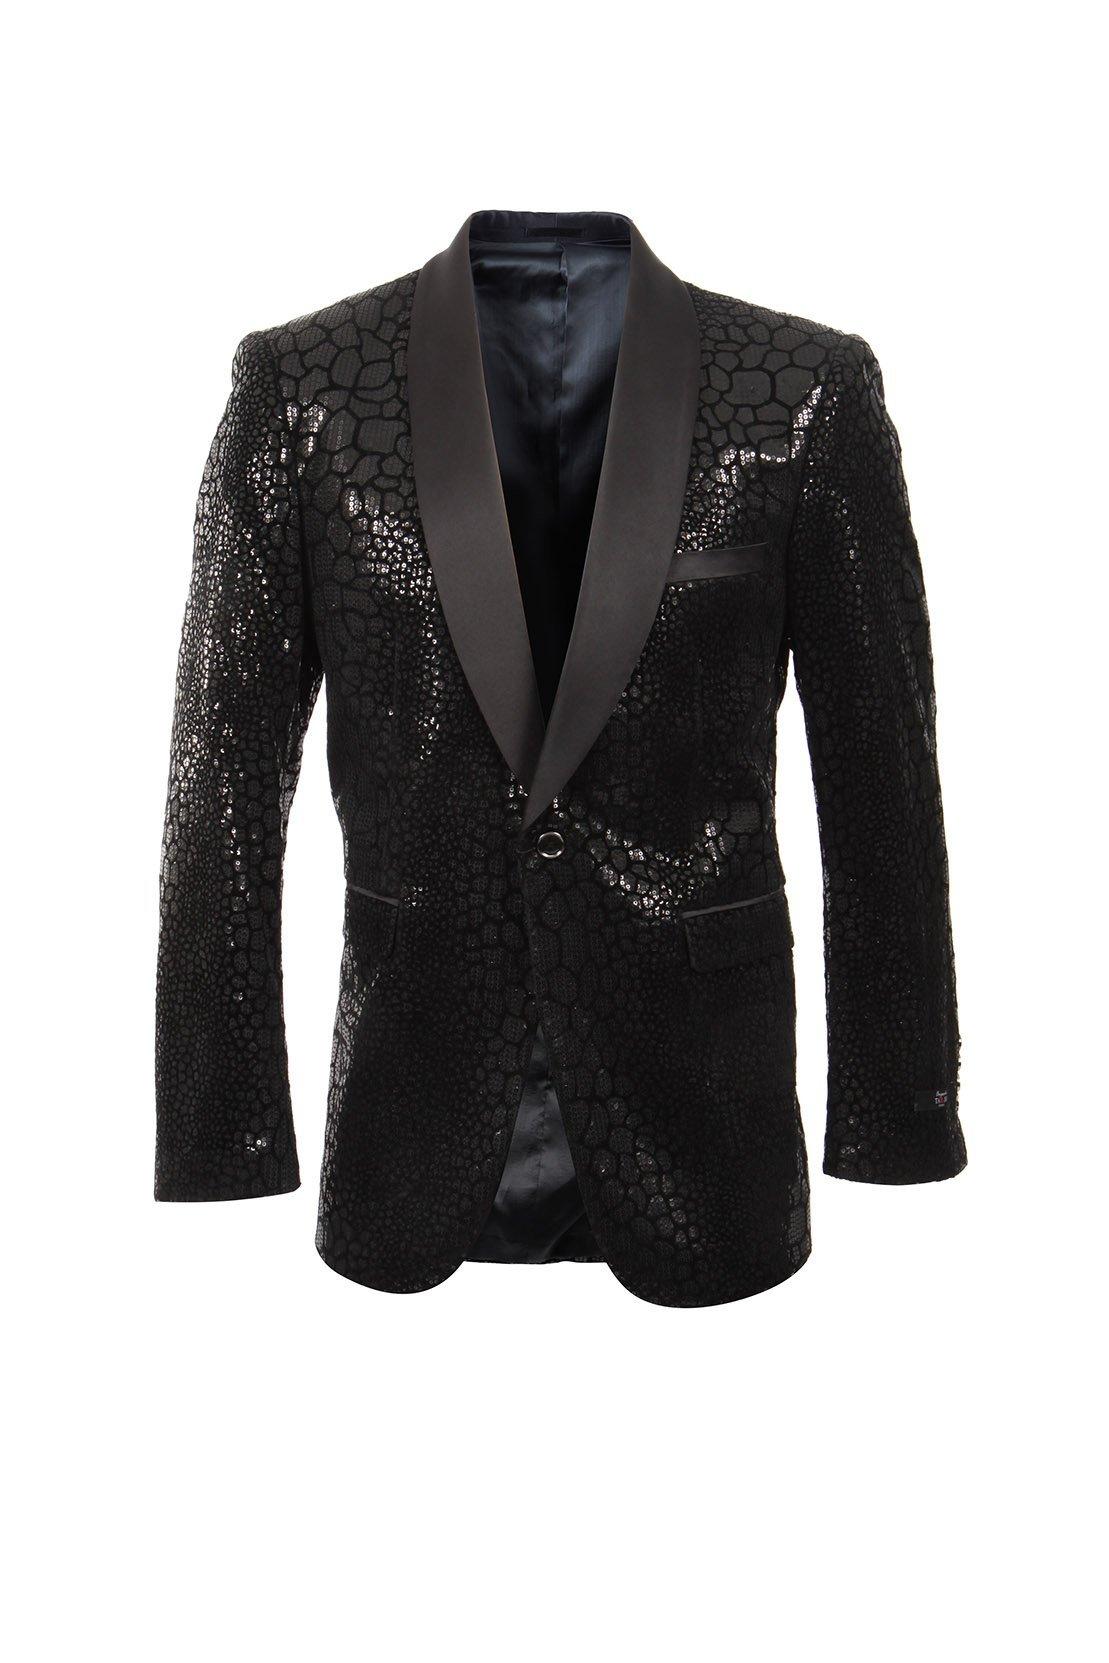 TAZIO Men Jacket Modern Fit Shiny Satin Shawl Collar Blazer Dinner Jacket